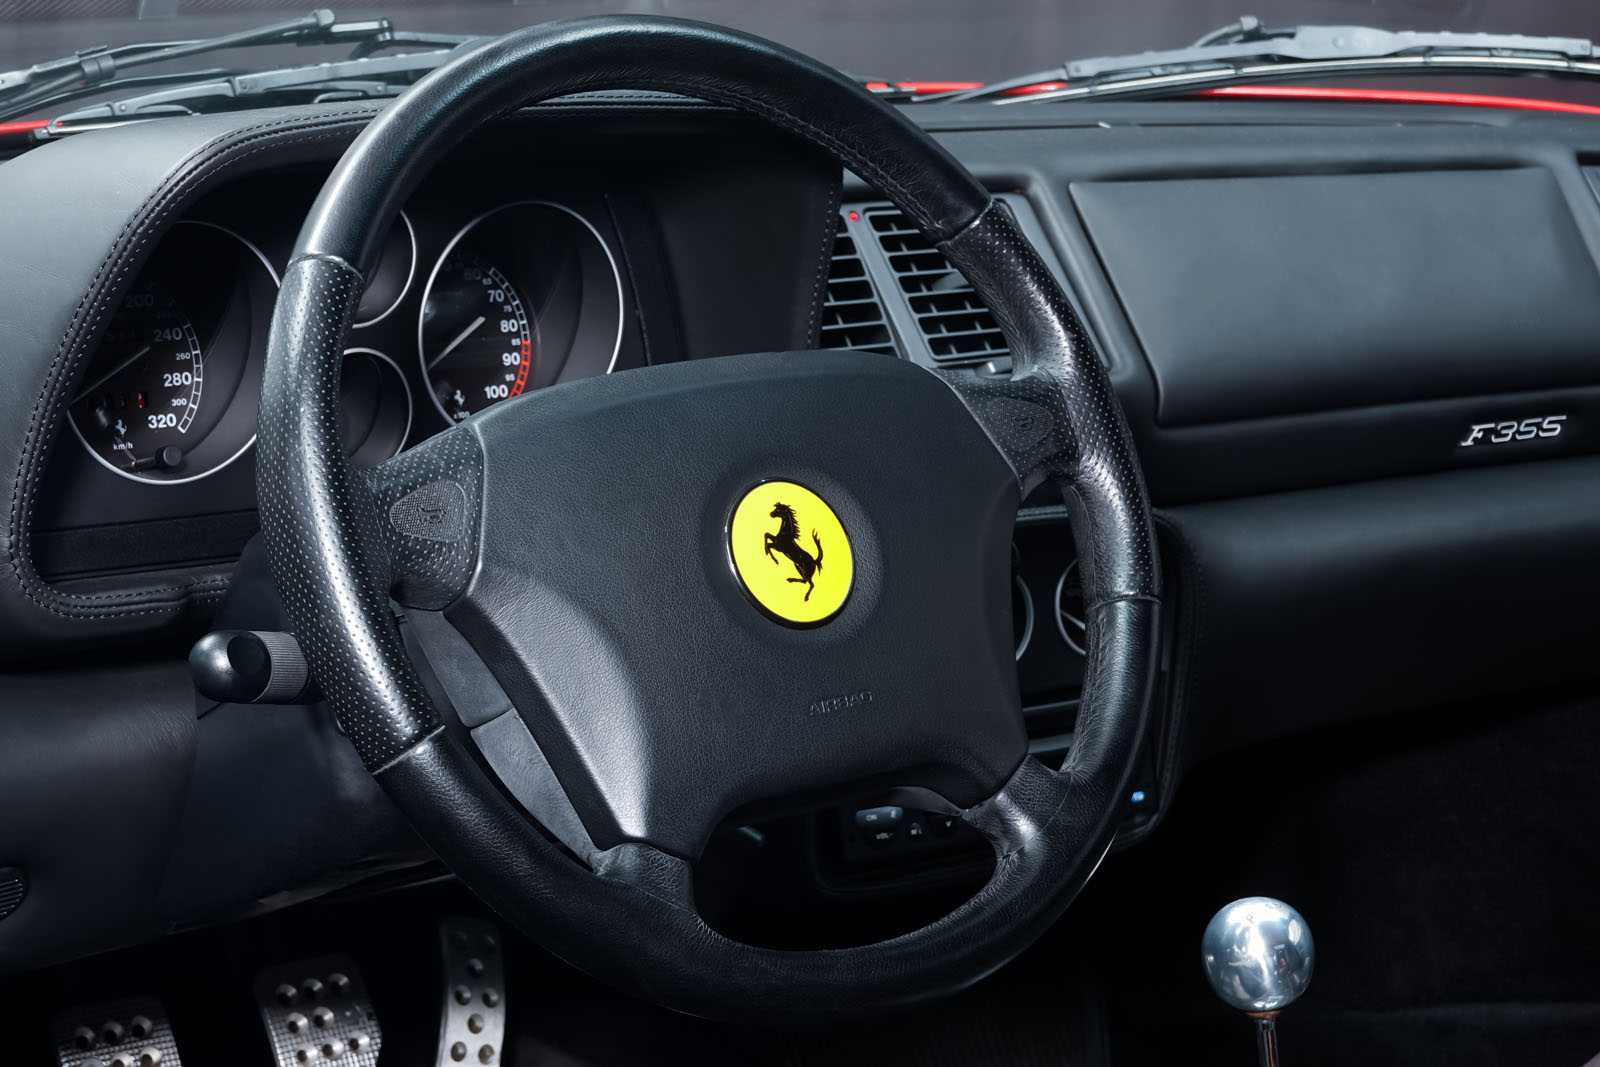 Ferrari_F355_Berlinetta_Rot_Schwarz_FER-7159_8_w